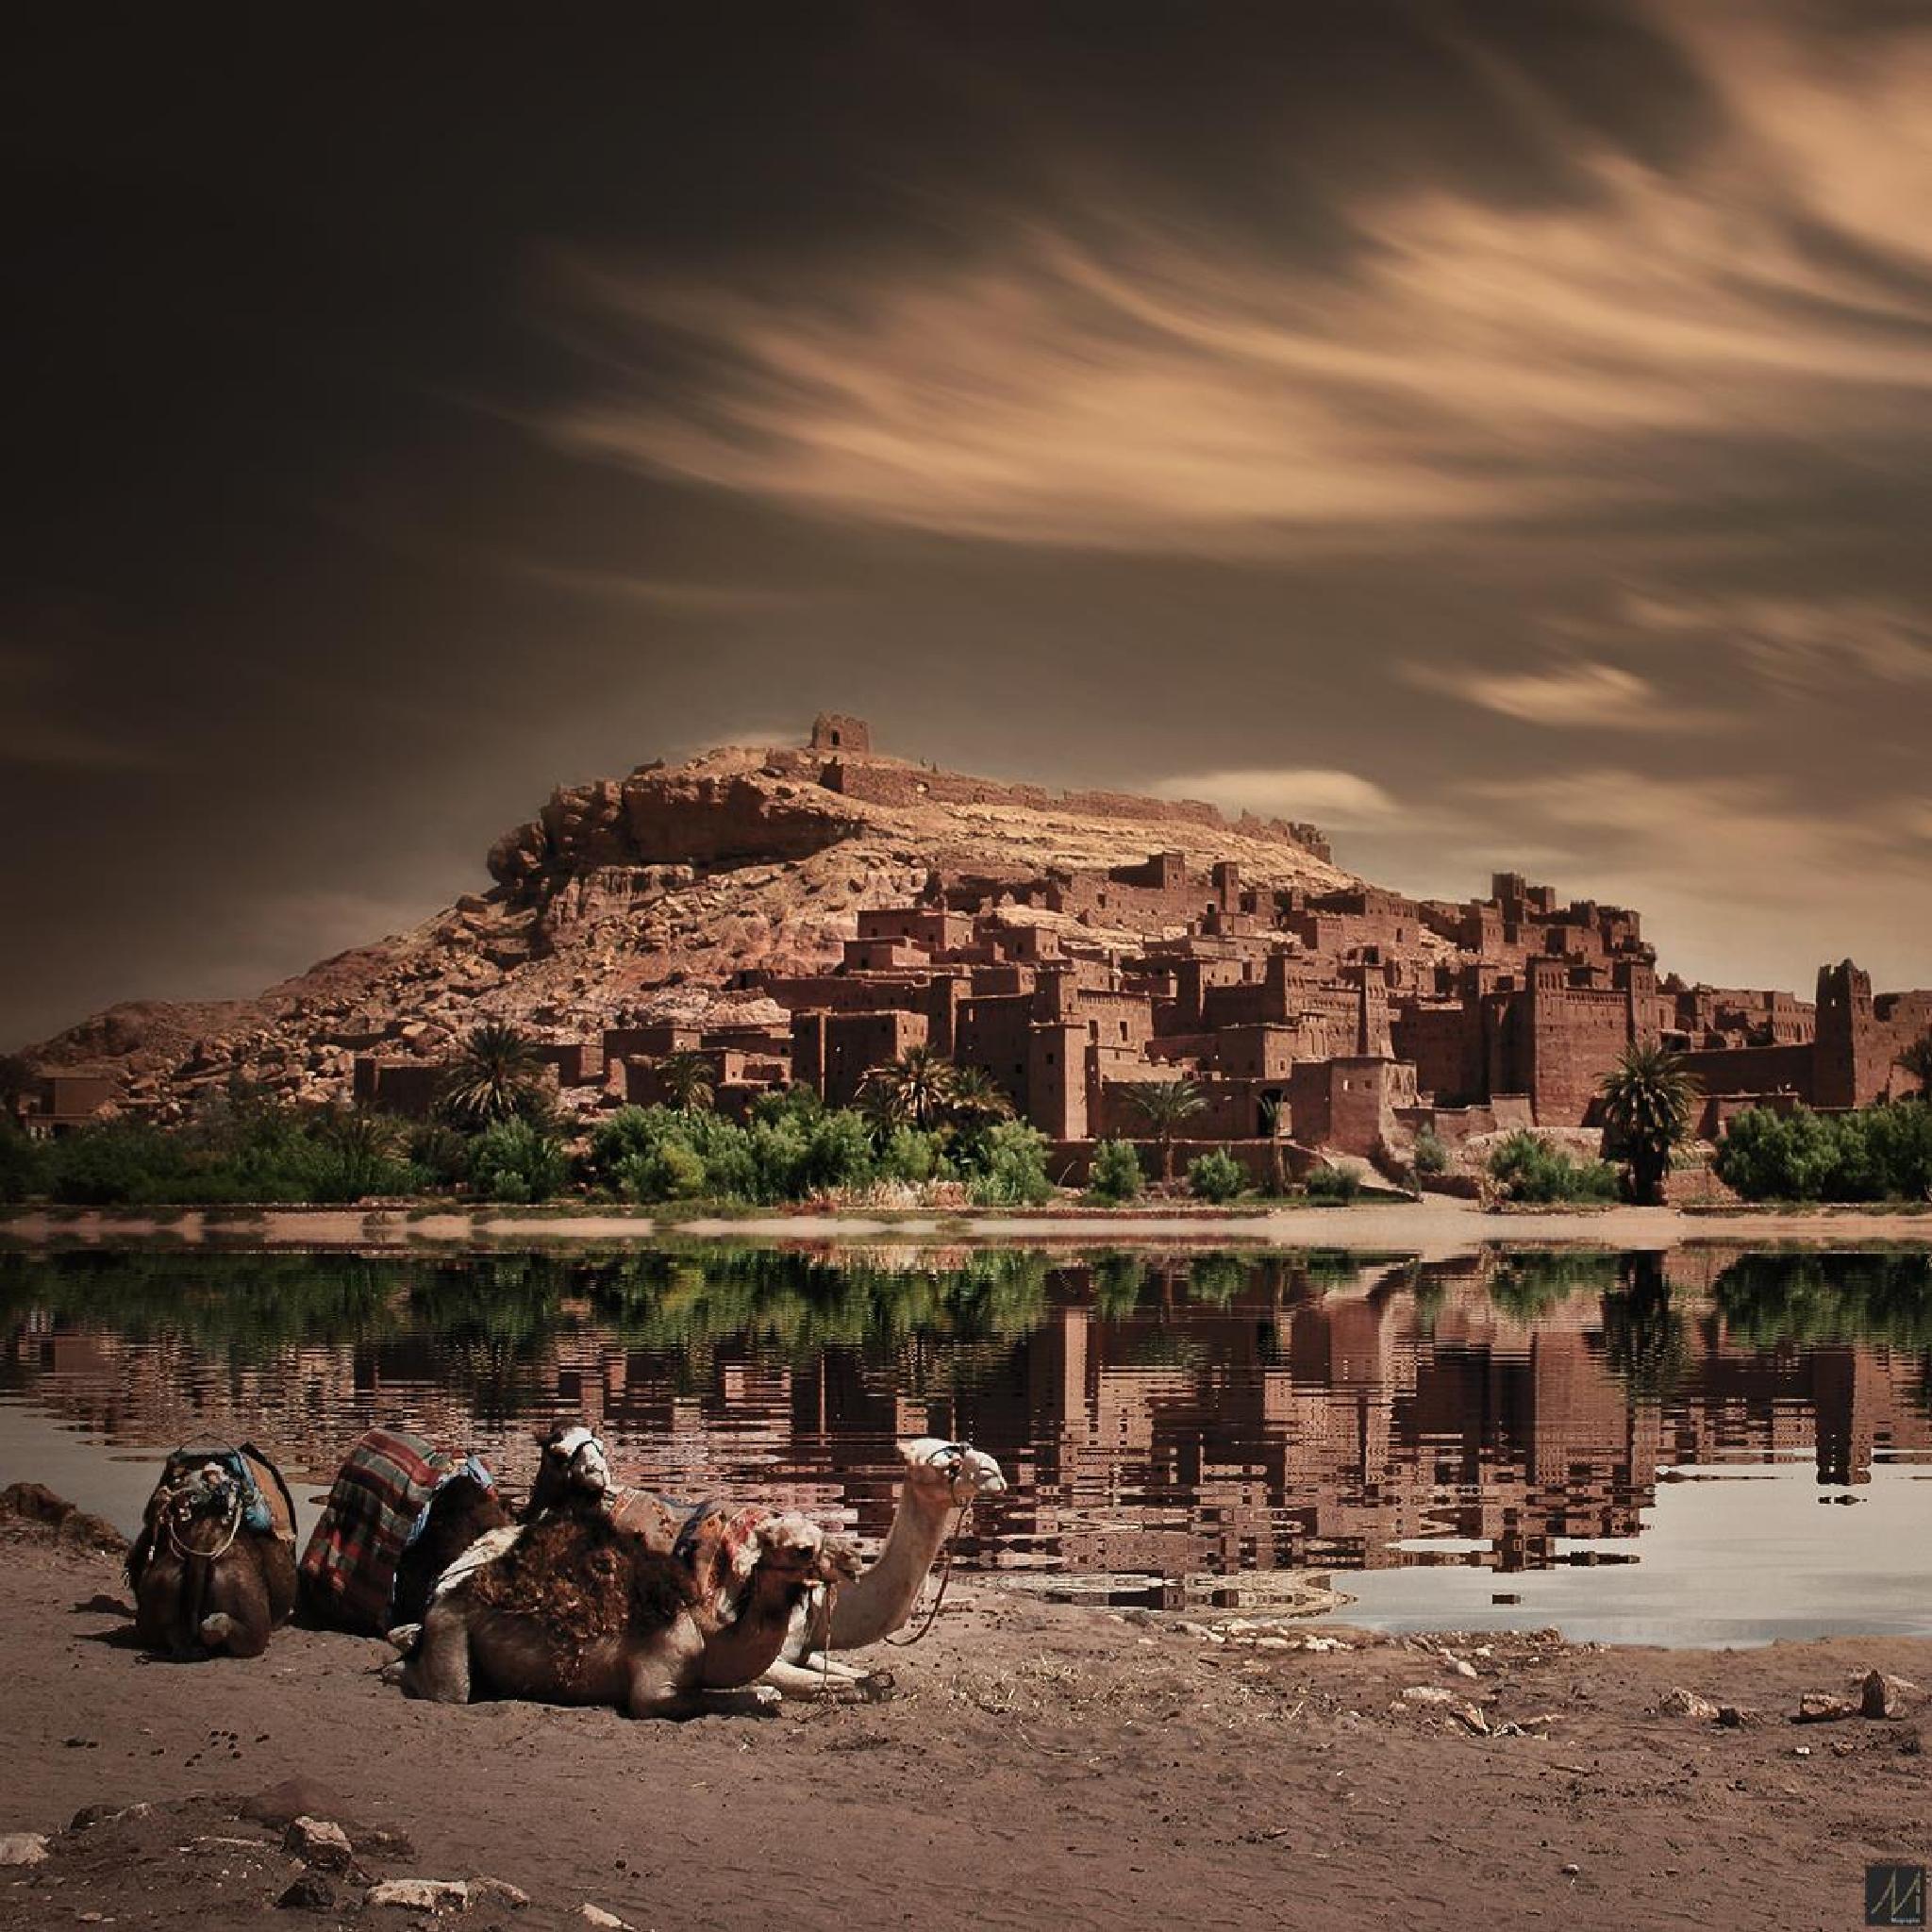 kasbah ait ben hadou / ouarzazate by Moussa Idrissi-MOGRAPHE